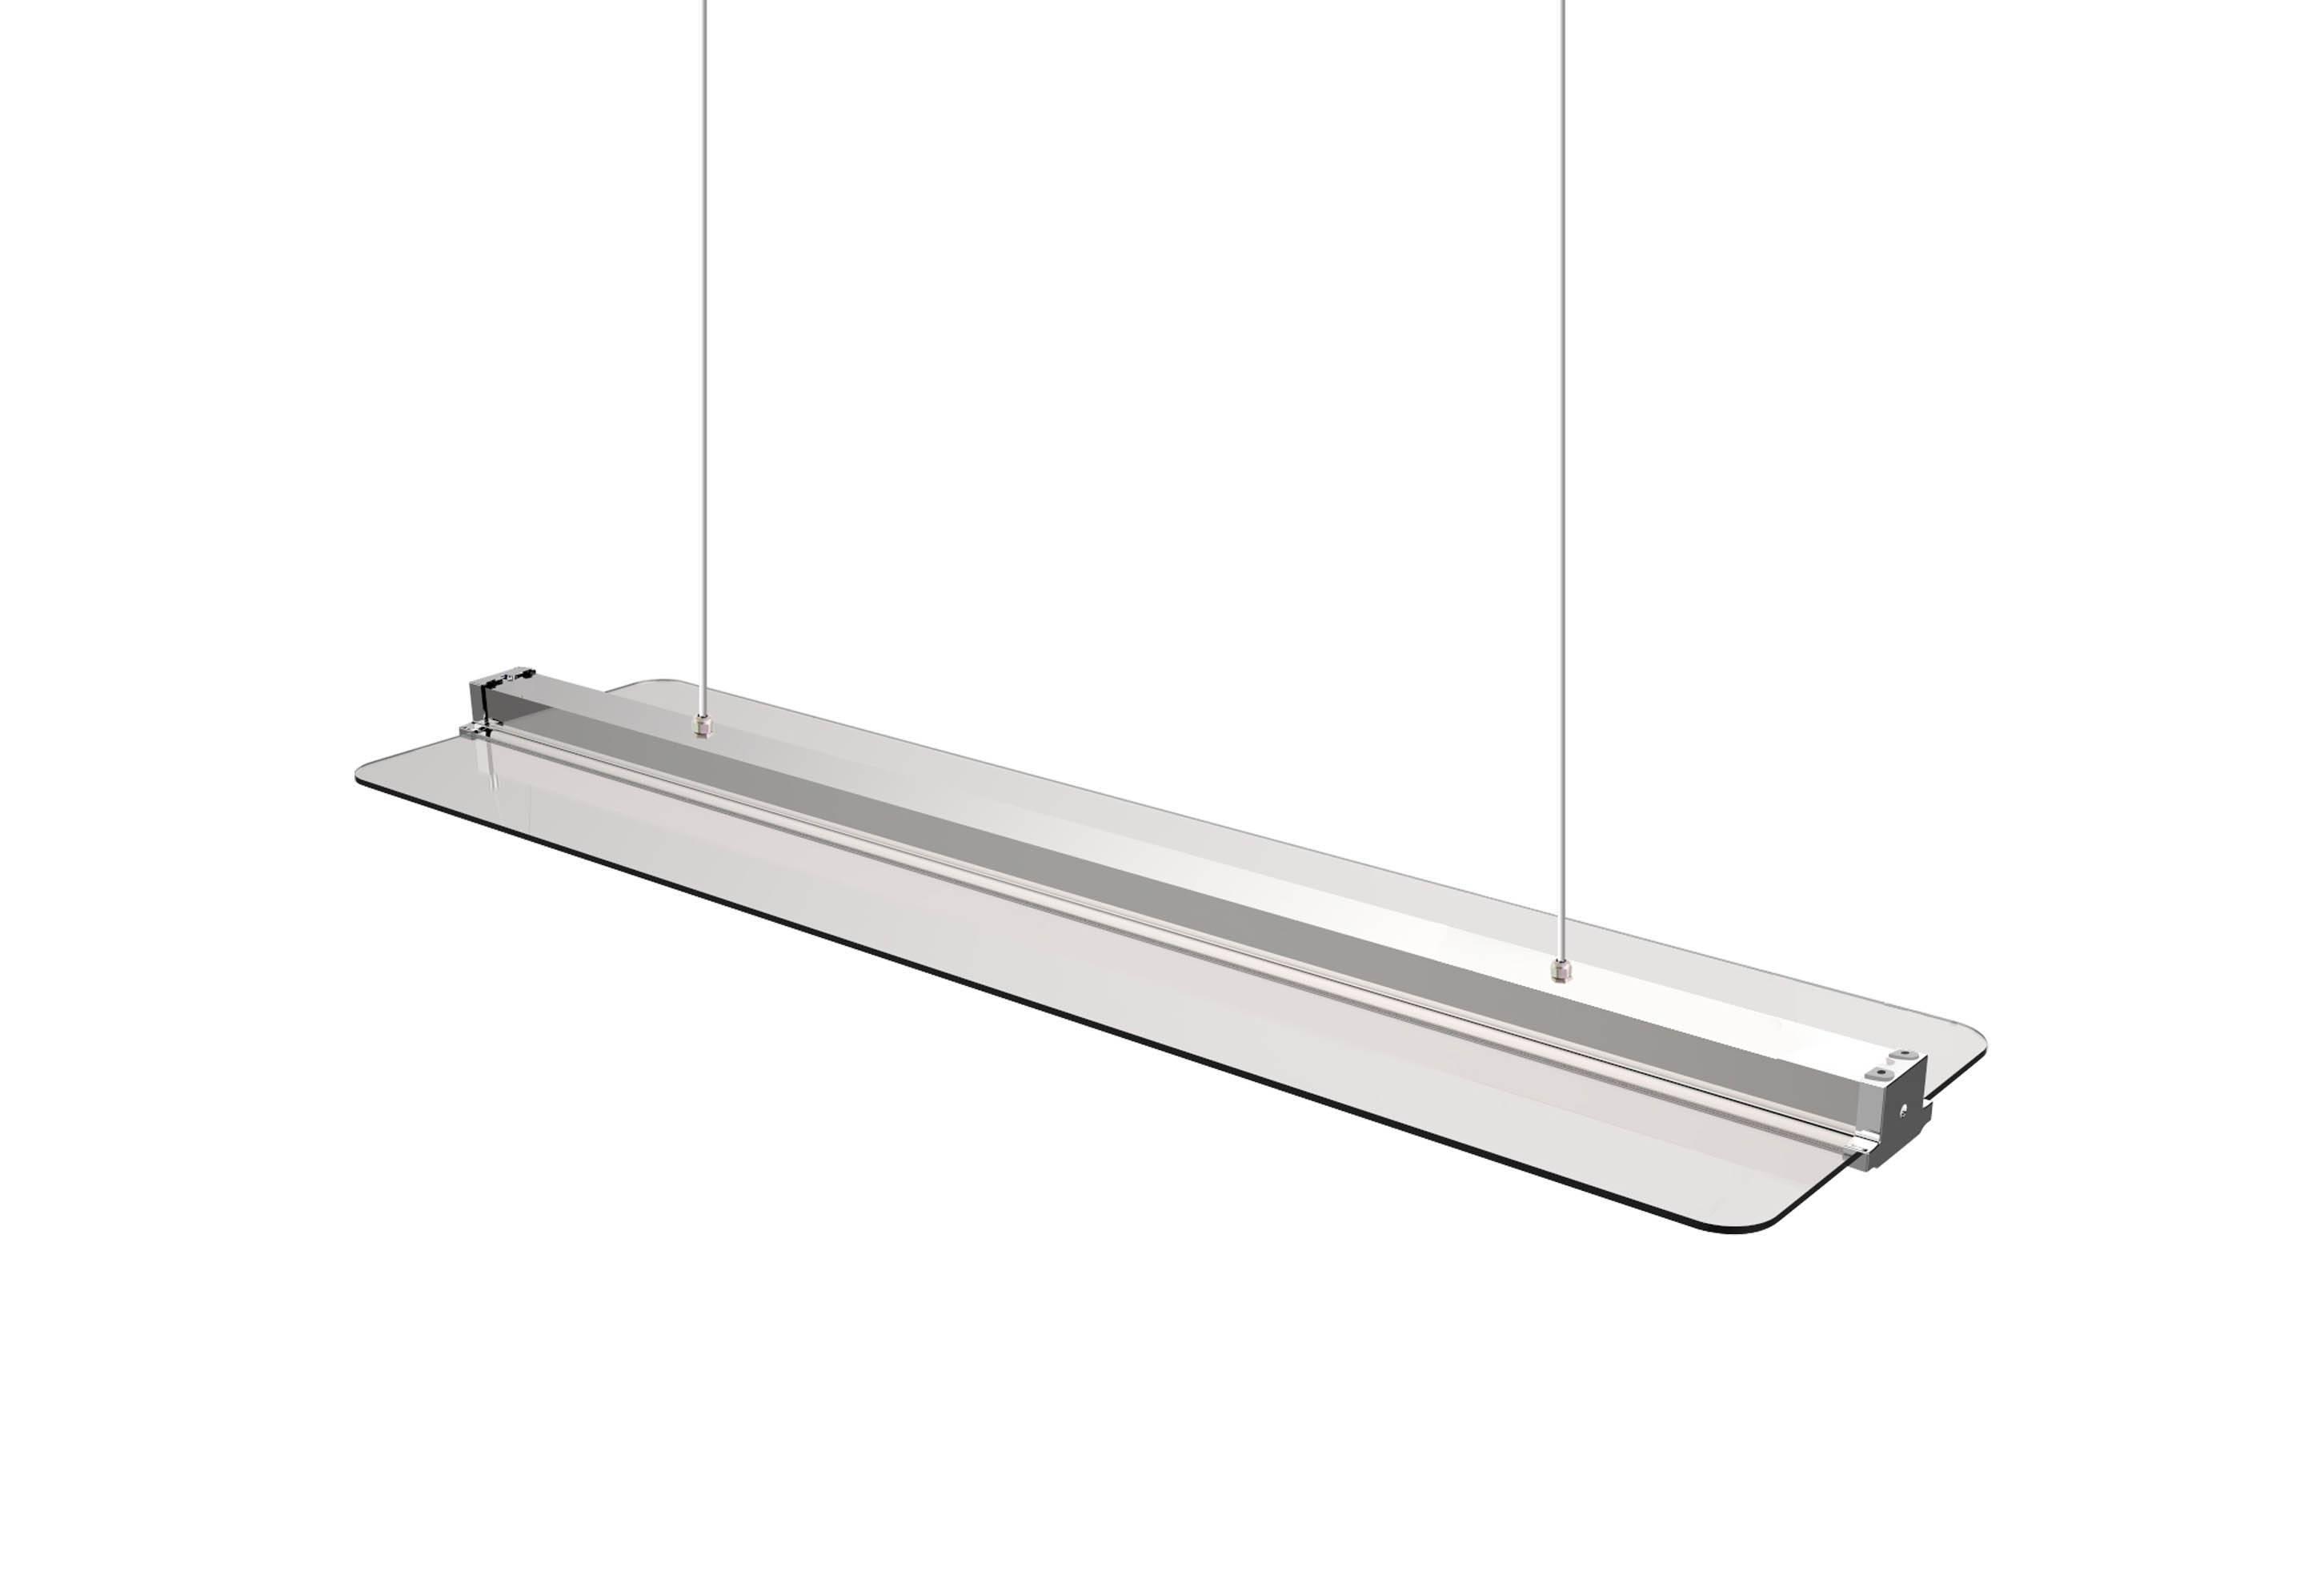 LED Deckenleuchte Transparent 30x120cm 40W CCT dimmbar